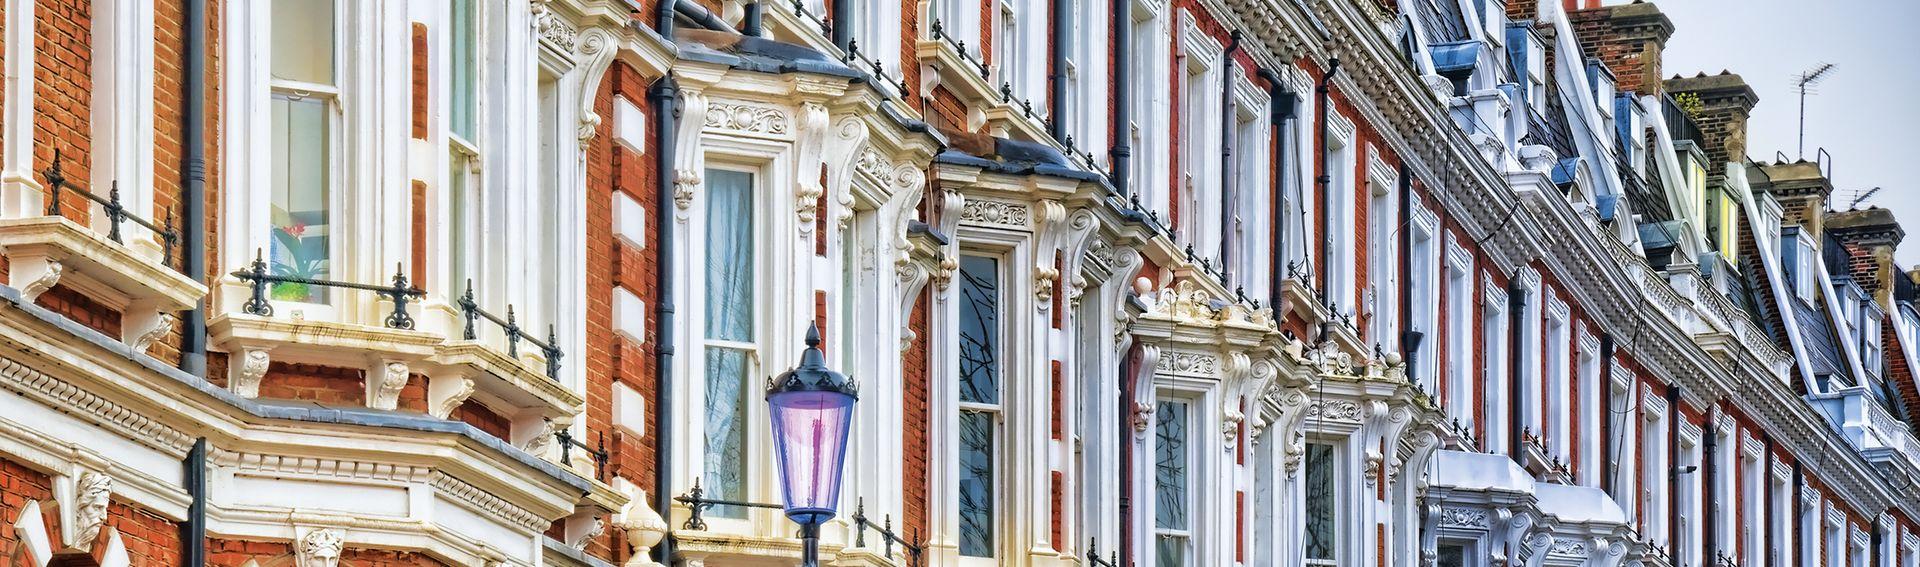 South Kensington / Chelsea